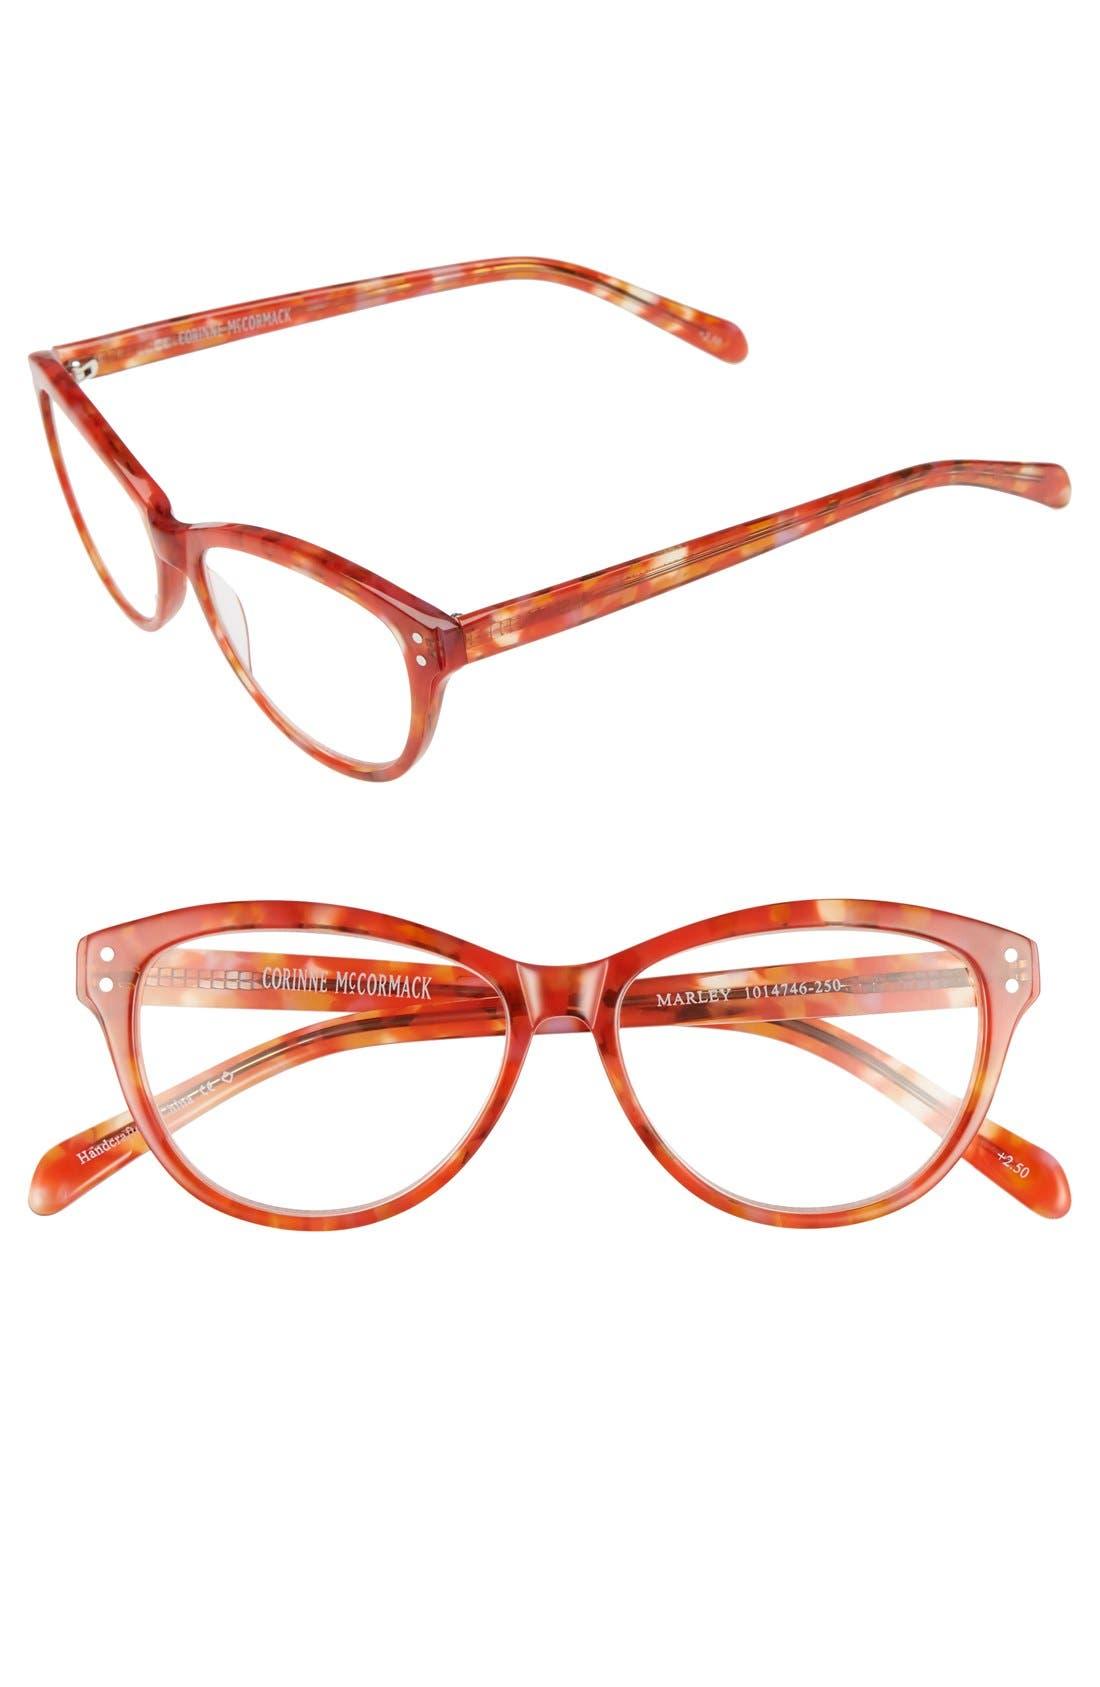 corinne mccormack marley 53mm reading glasses nordstrom